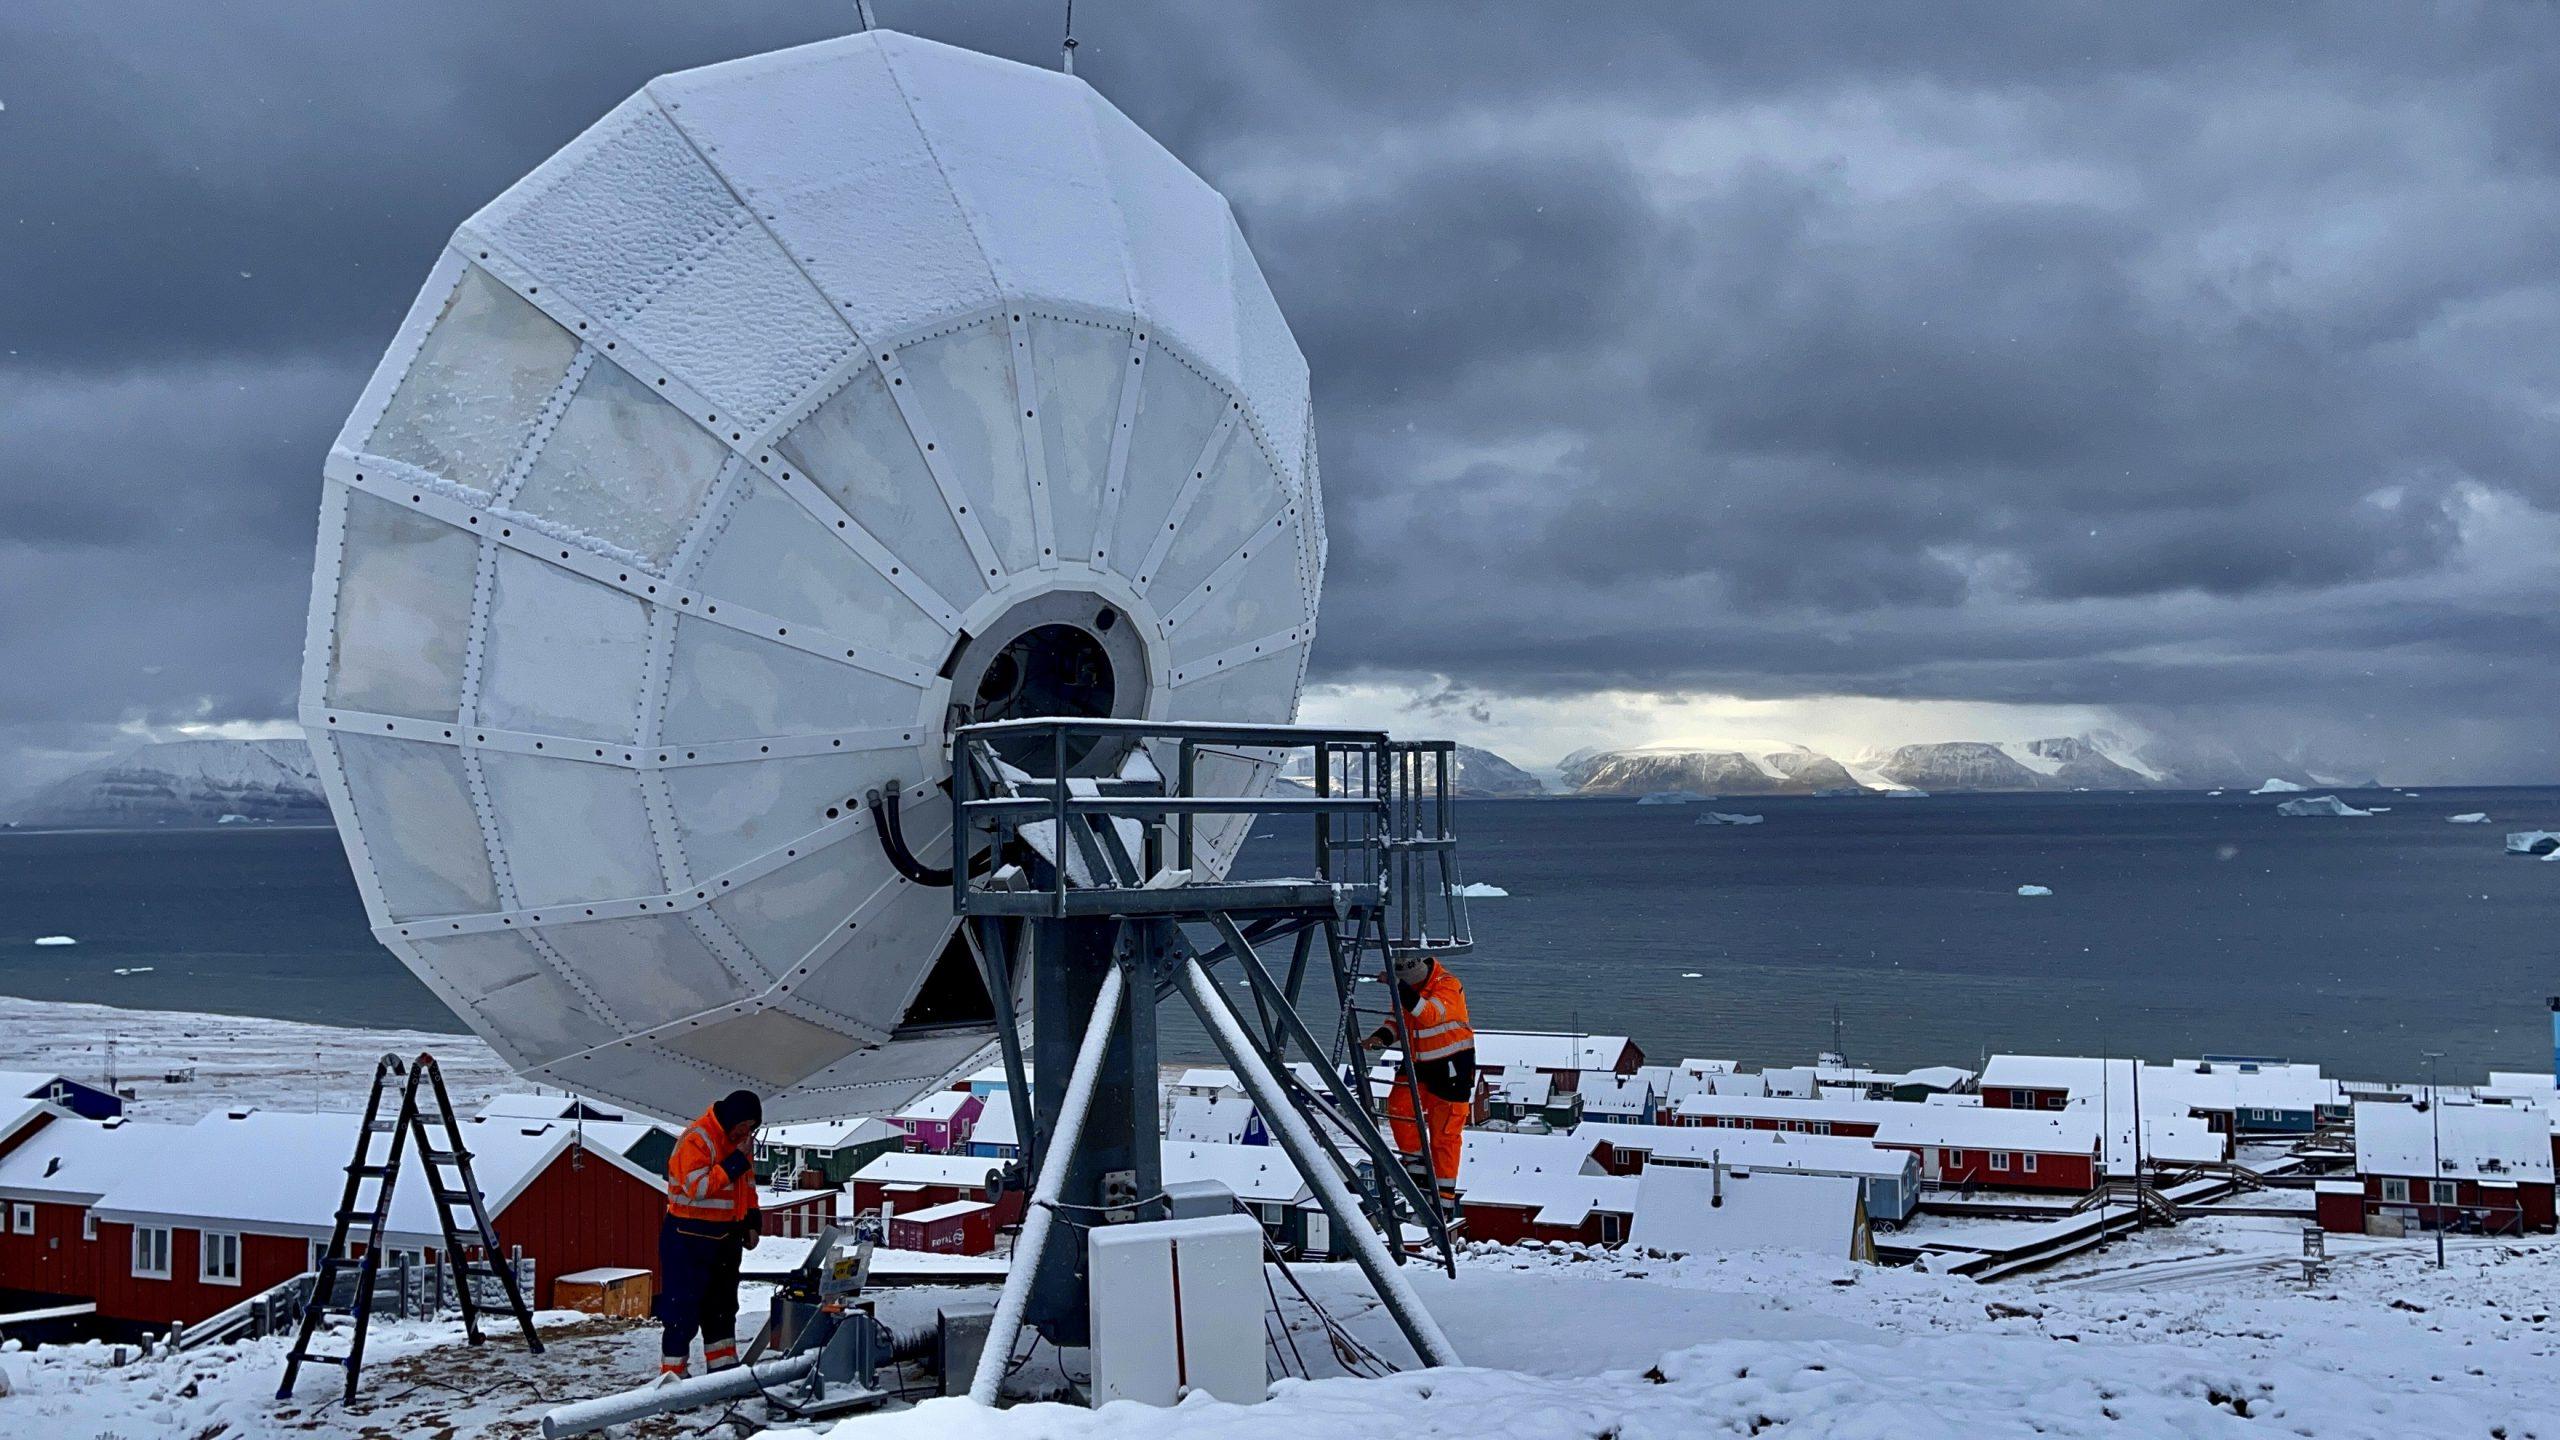 VertexRSI 7.2m antenna installed in Qaanaaq